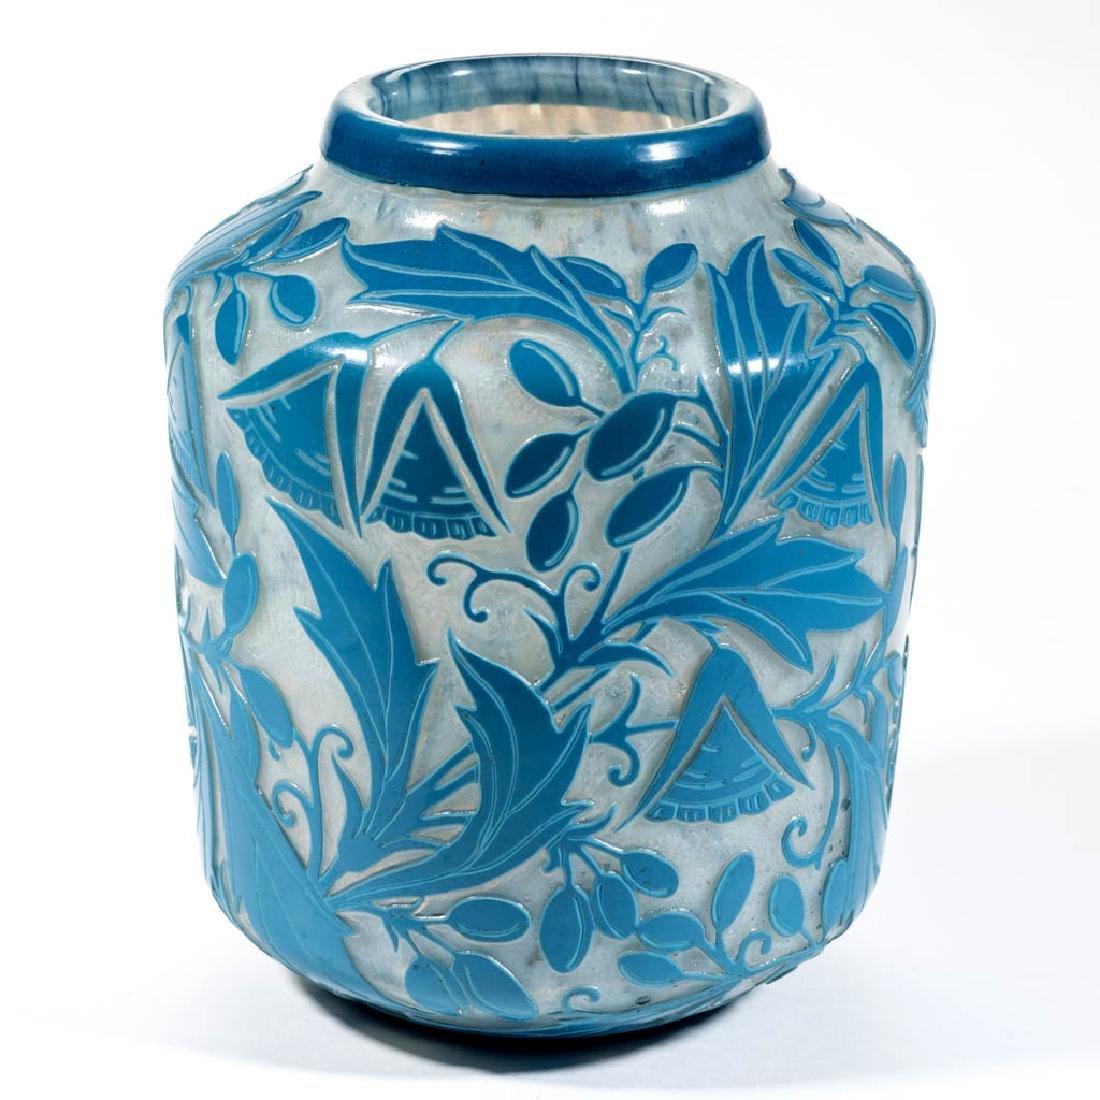 DAUM NANCY FLORAL CAMEO ART GLASS VASE